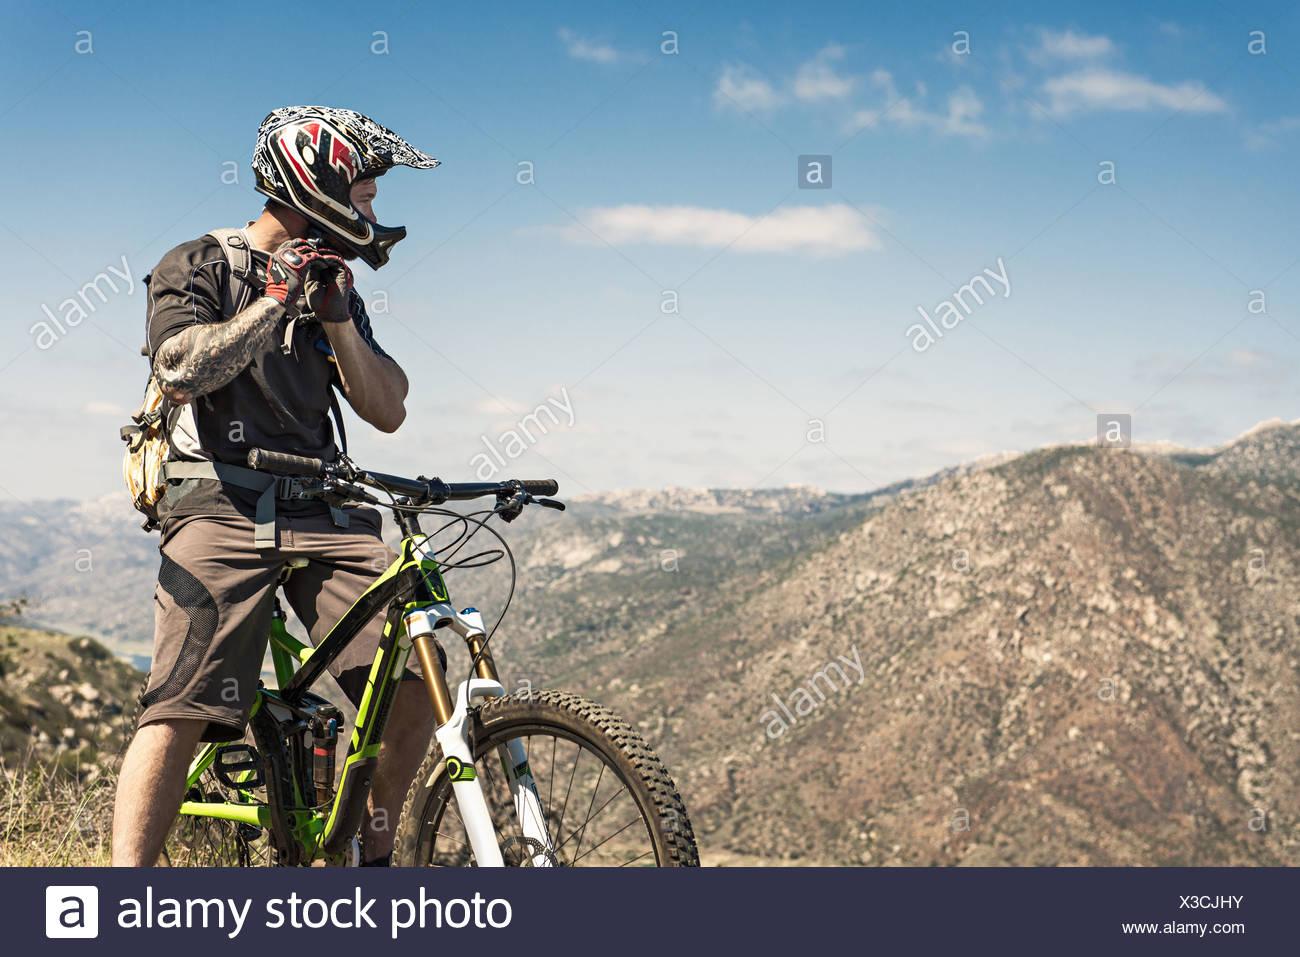 Downhill mountain biker putting on helmet Stock Photo